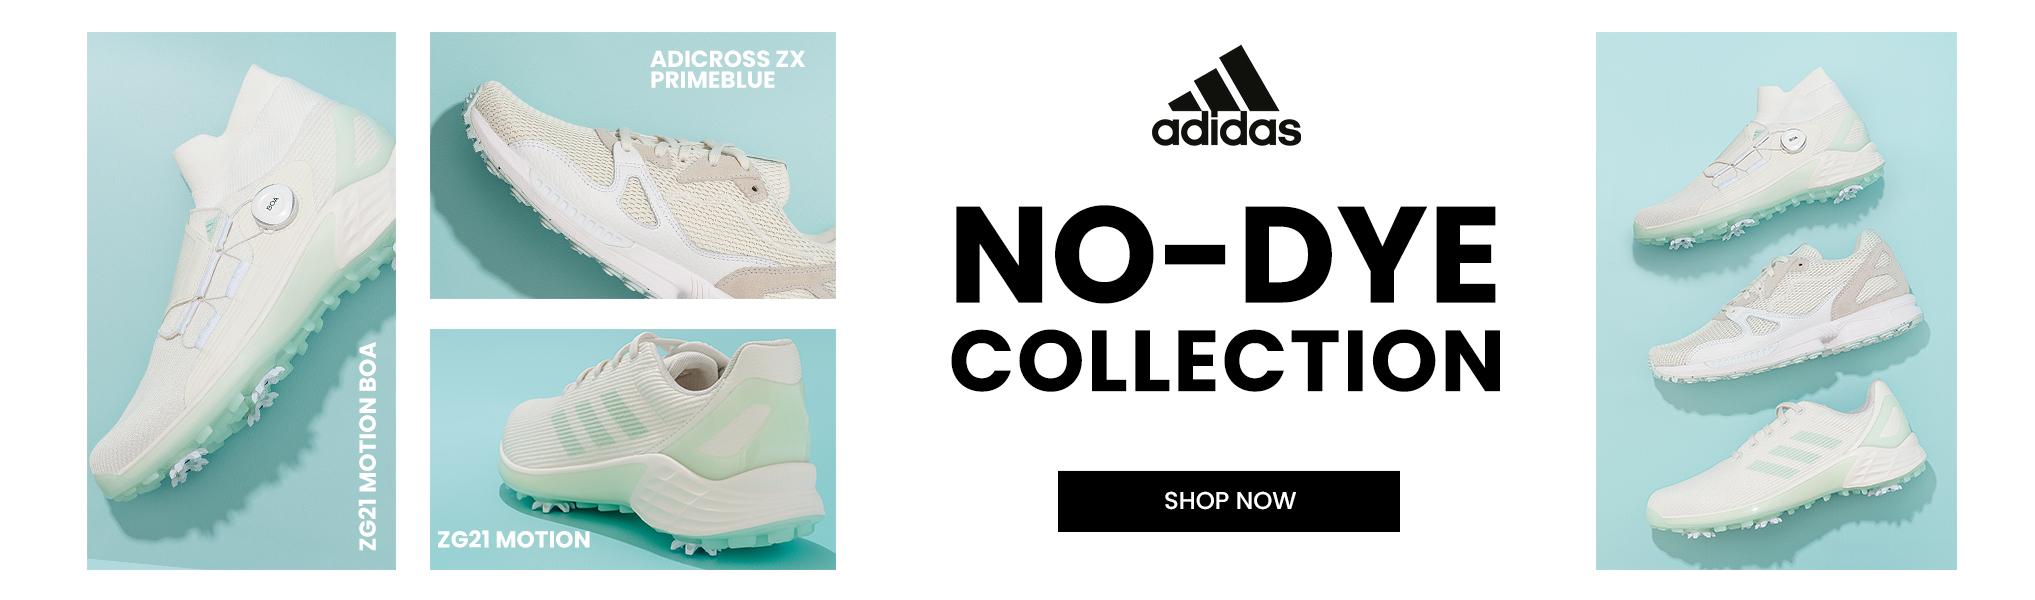 no-dye collection